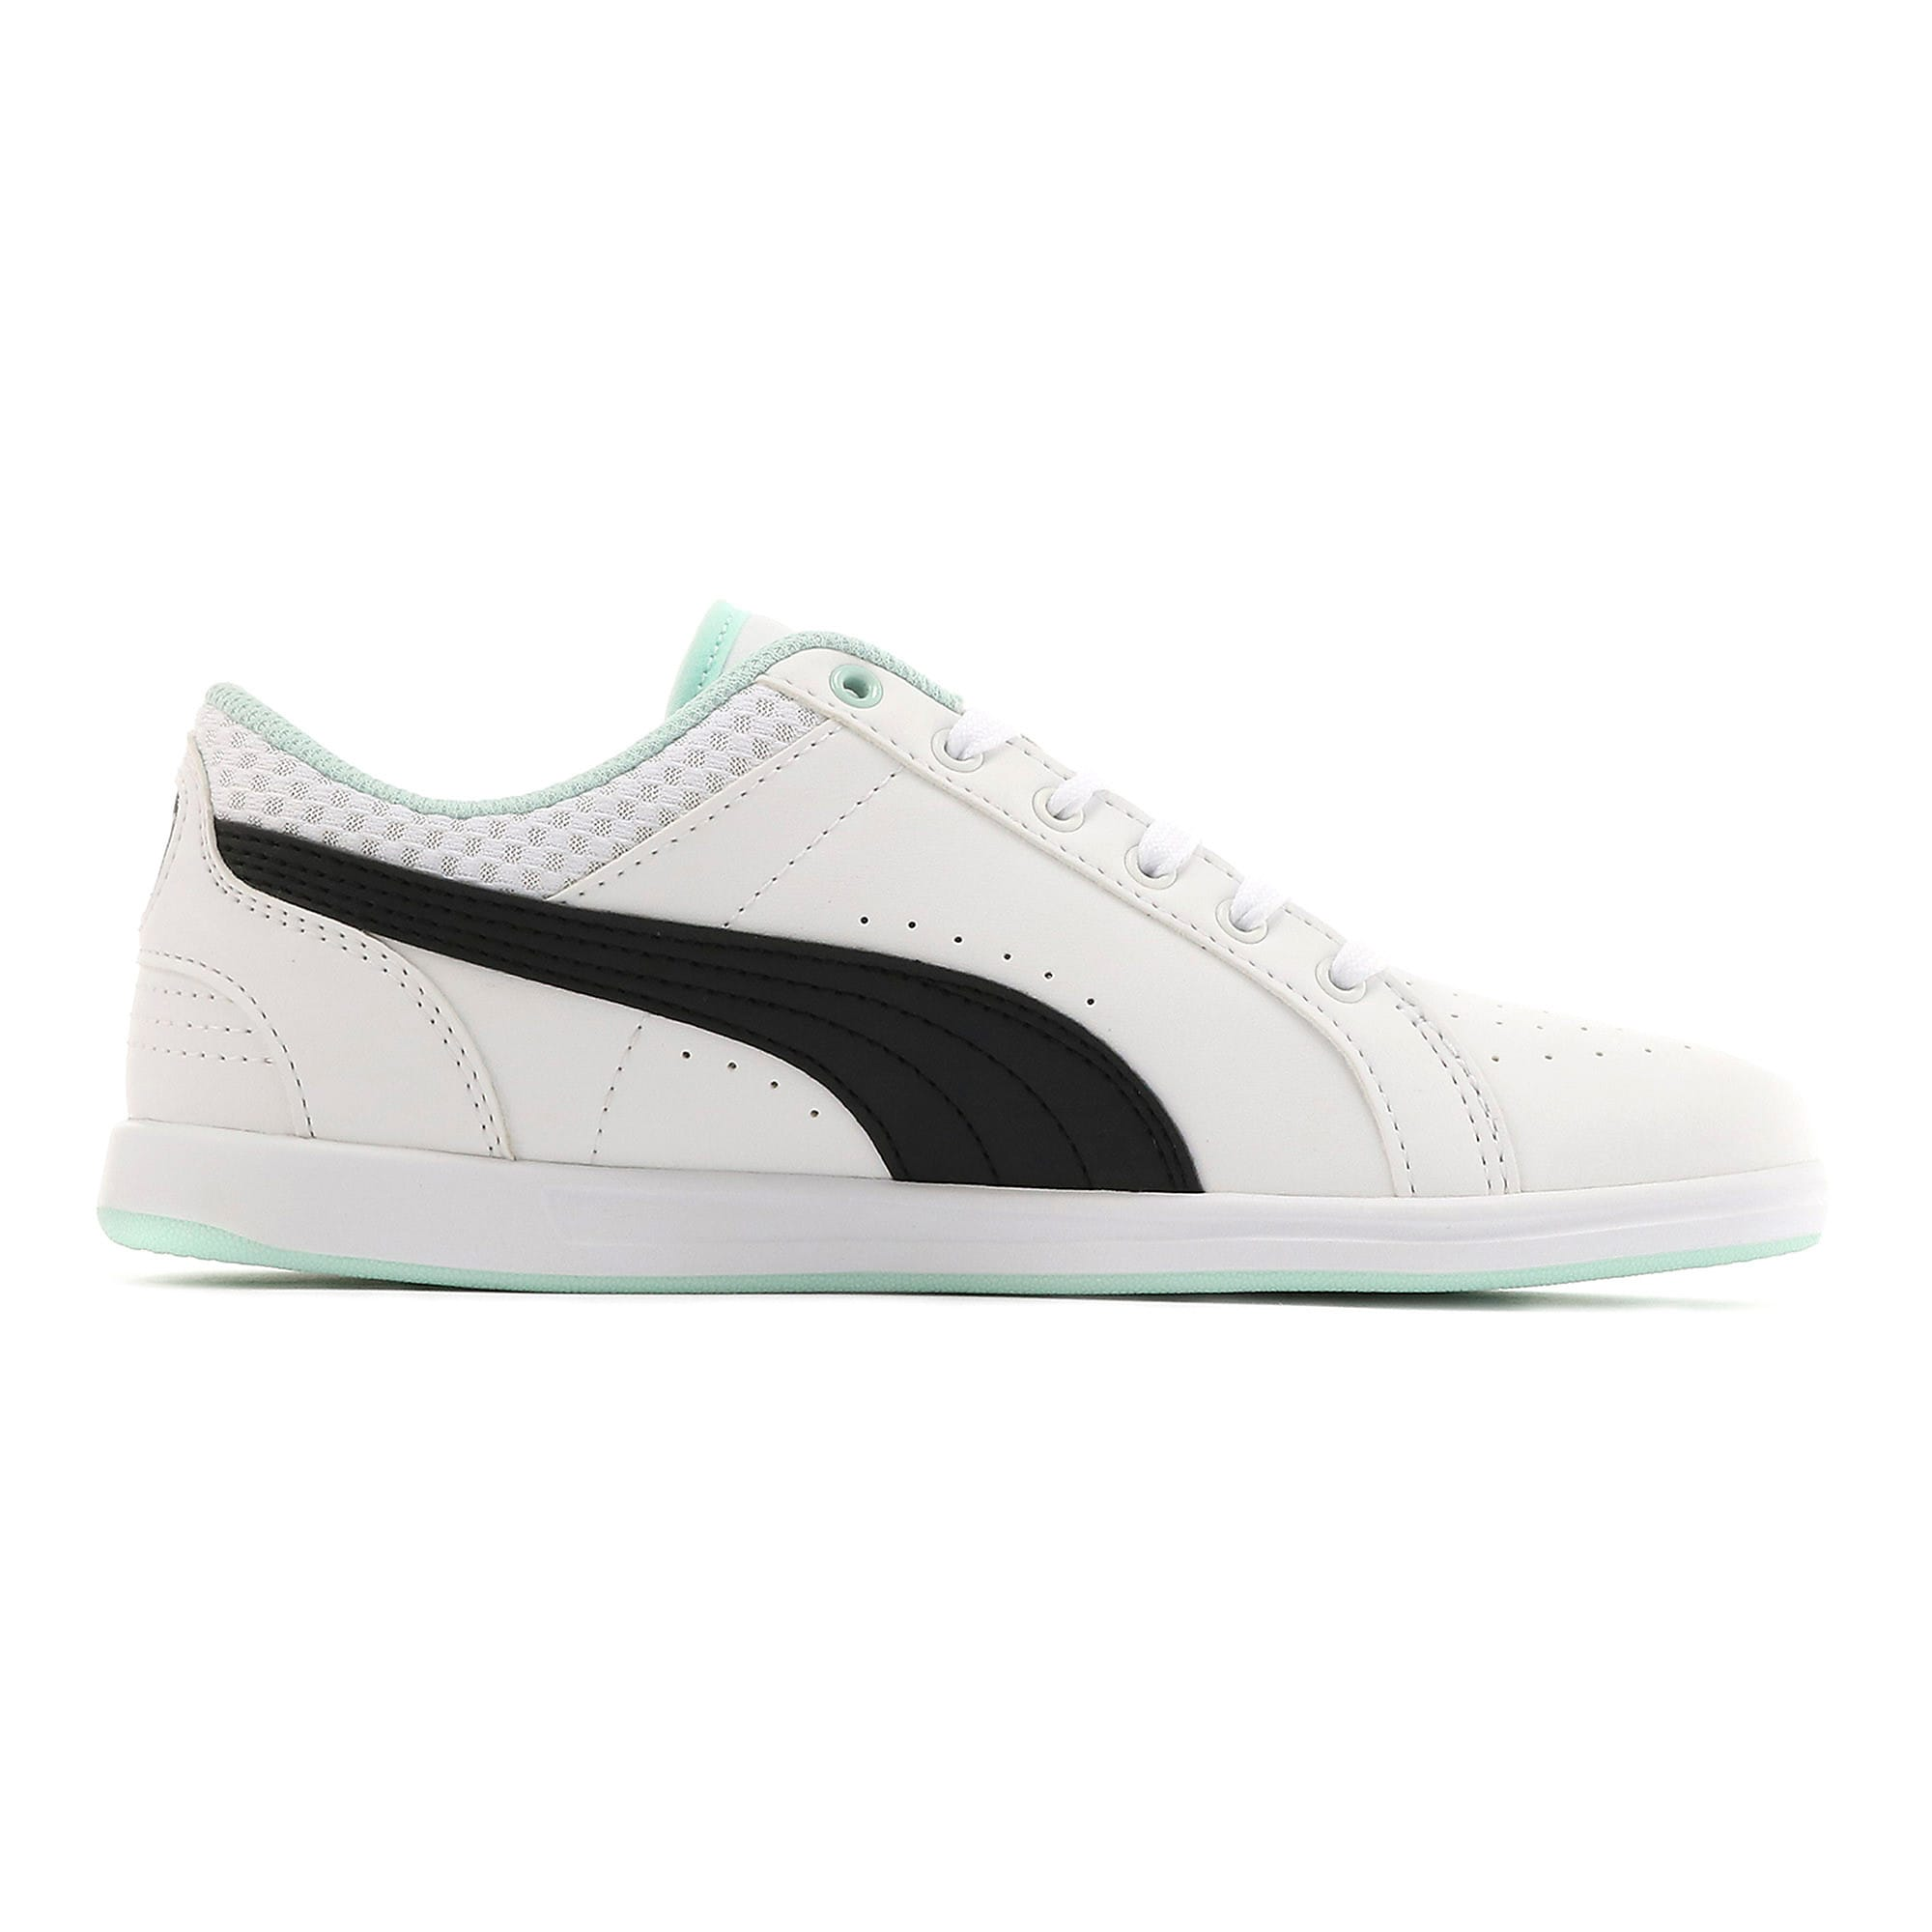 Thumbnail 5 of Ikaz Lo v2 Women's Sneakers, Puma White-Puma Black-, medium-IND